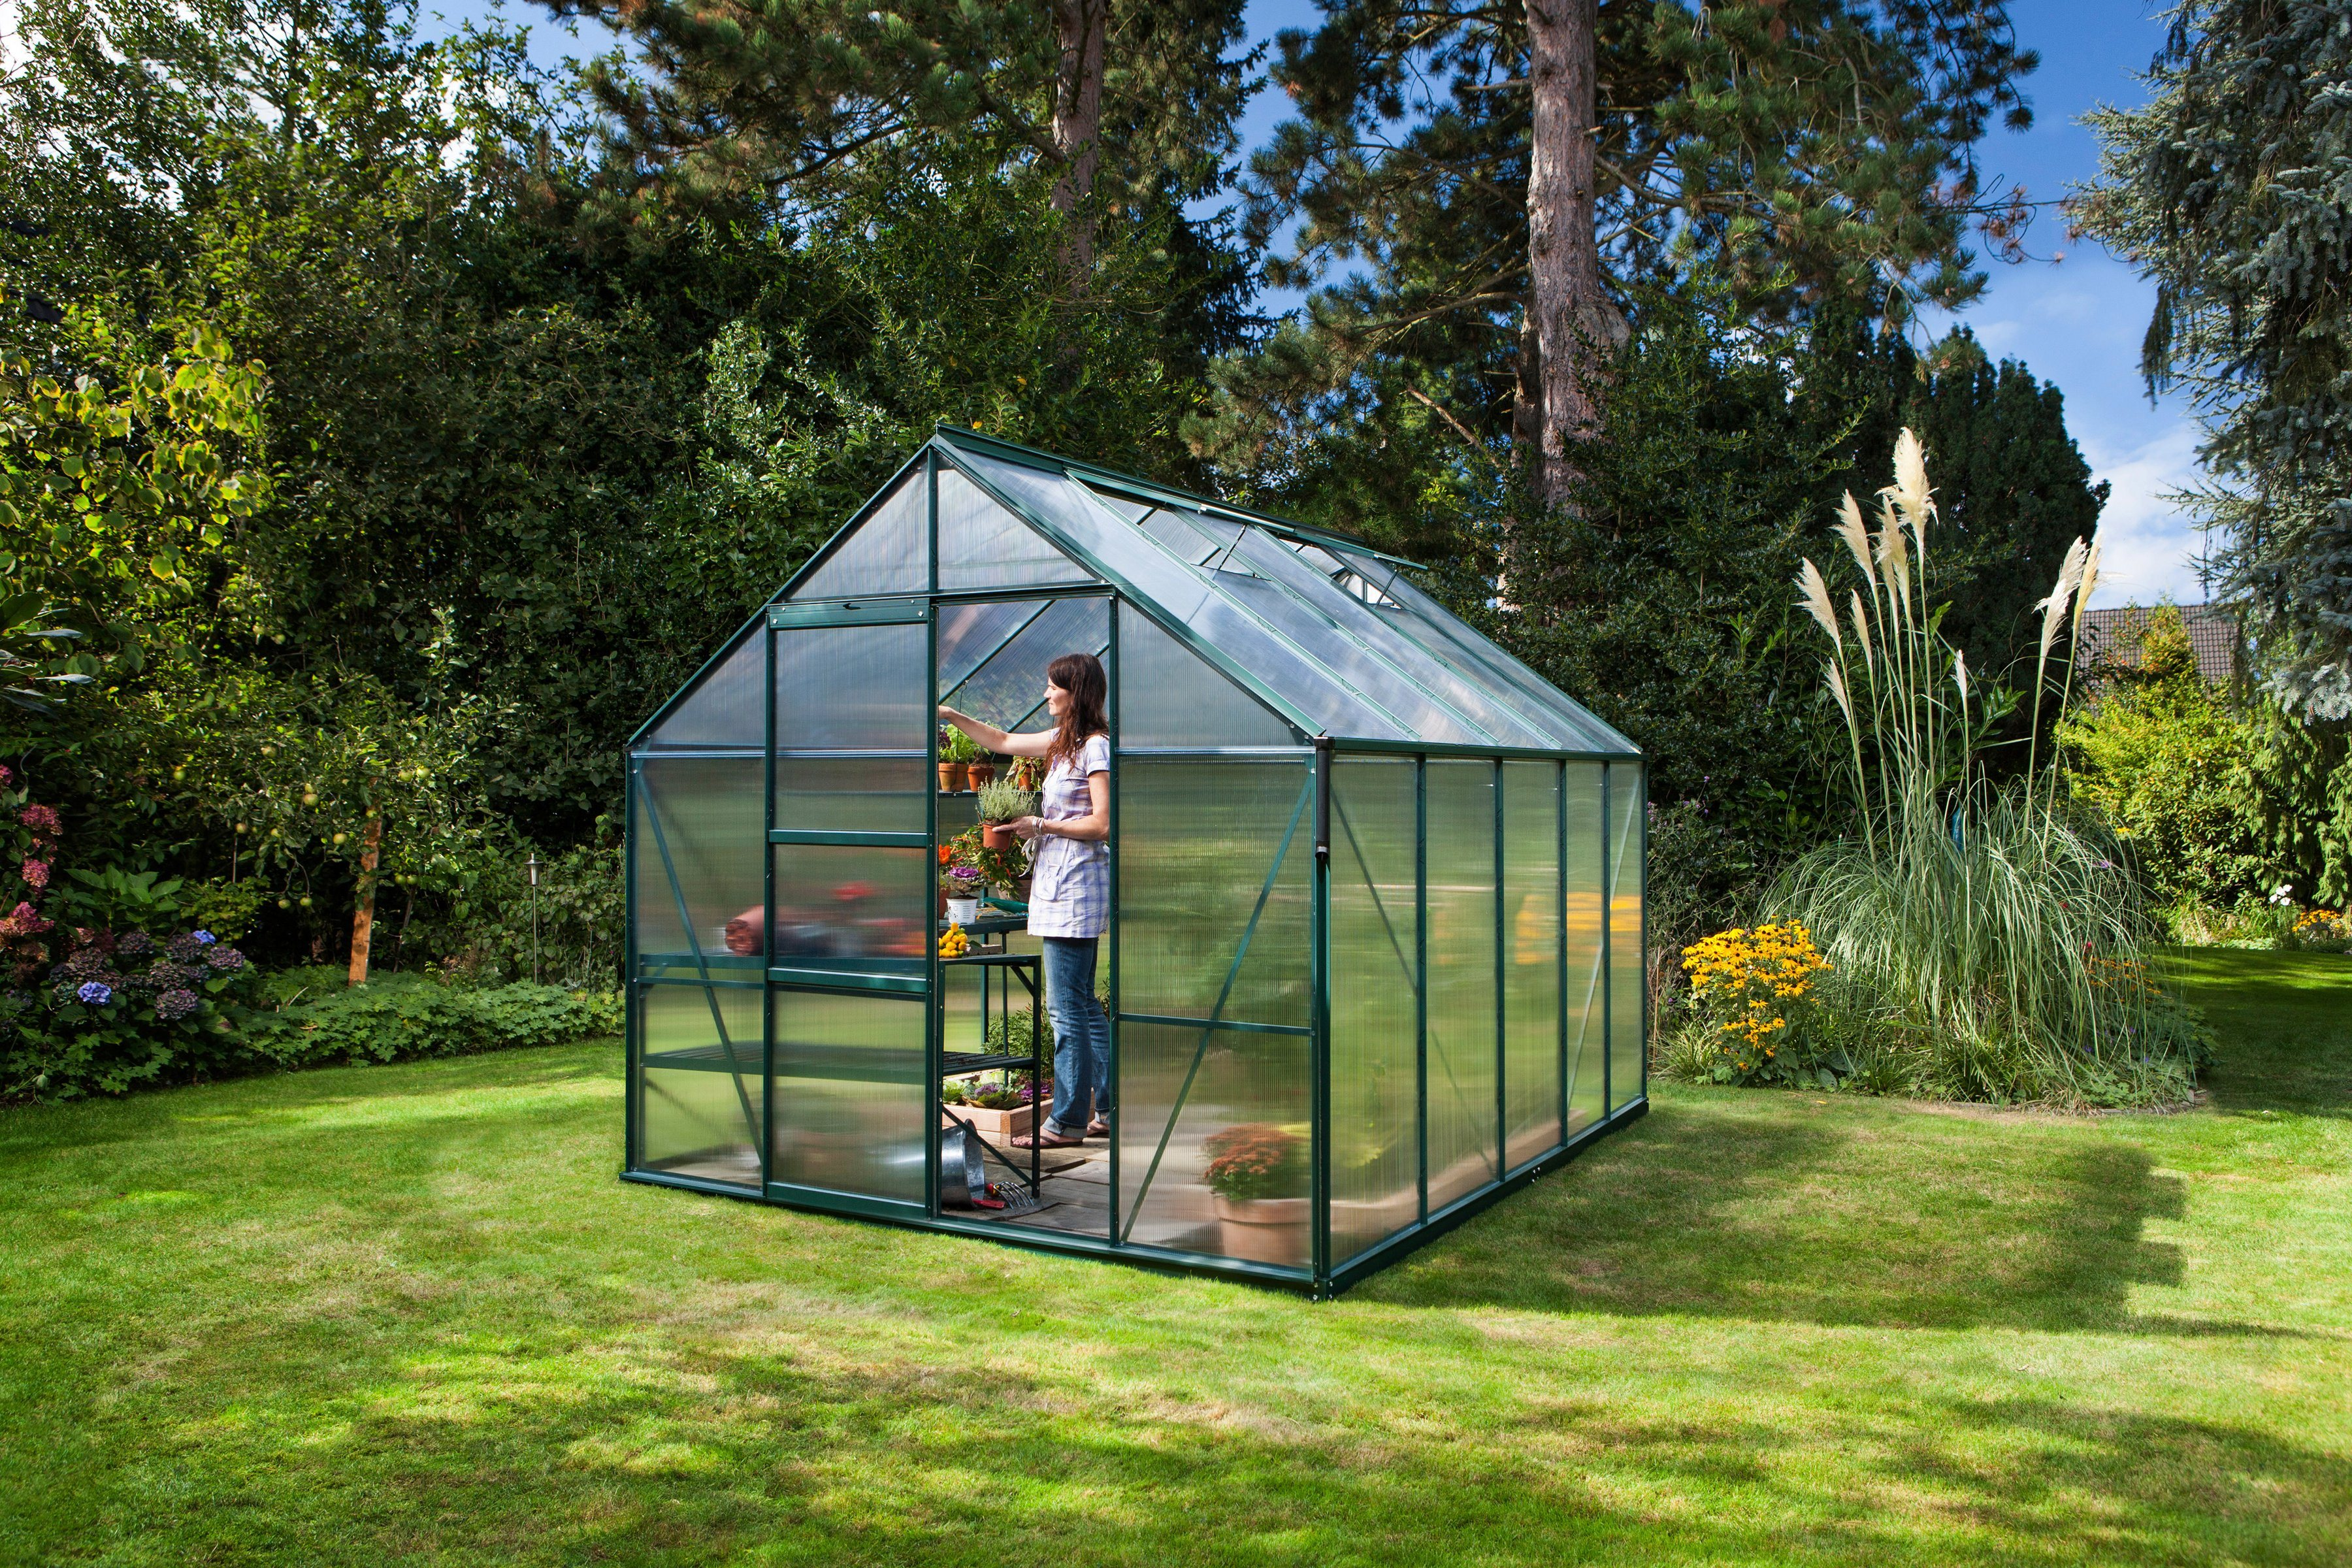 VITAVIA Gewächshaus »Merkur 8300«, BxTxH: 254x317x230 cm, grün, 4 mm | Garten > Gewächshäuser | Vitavia